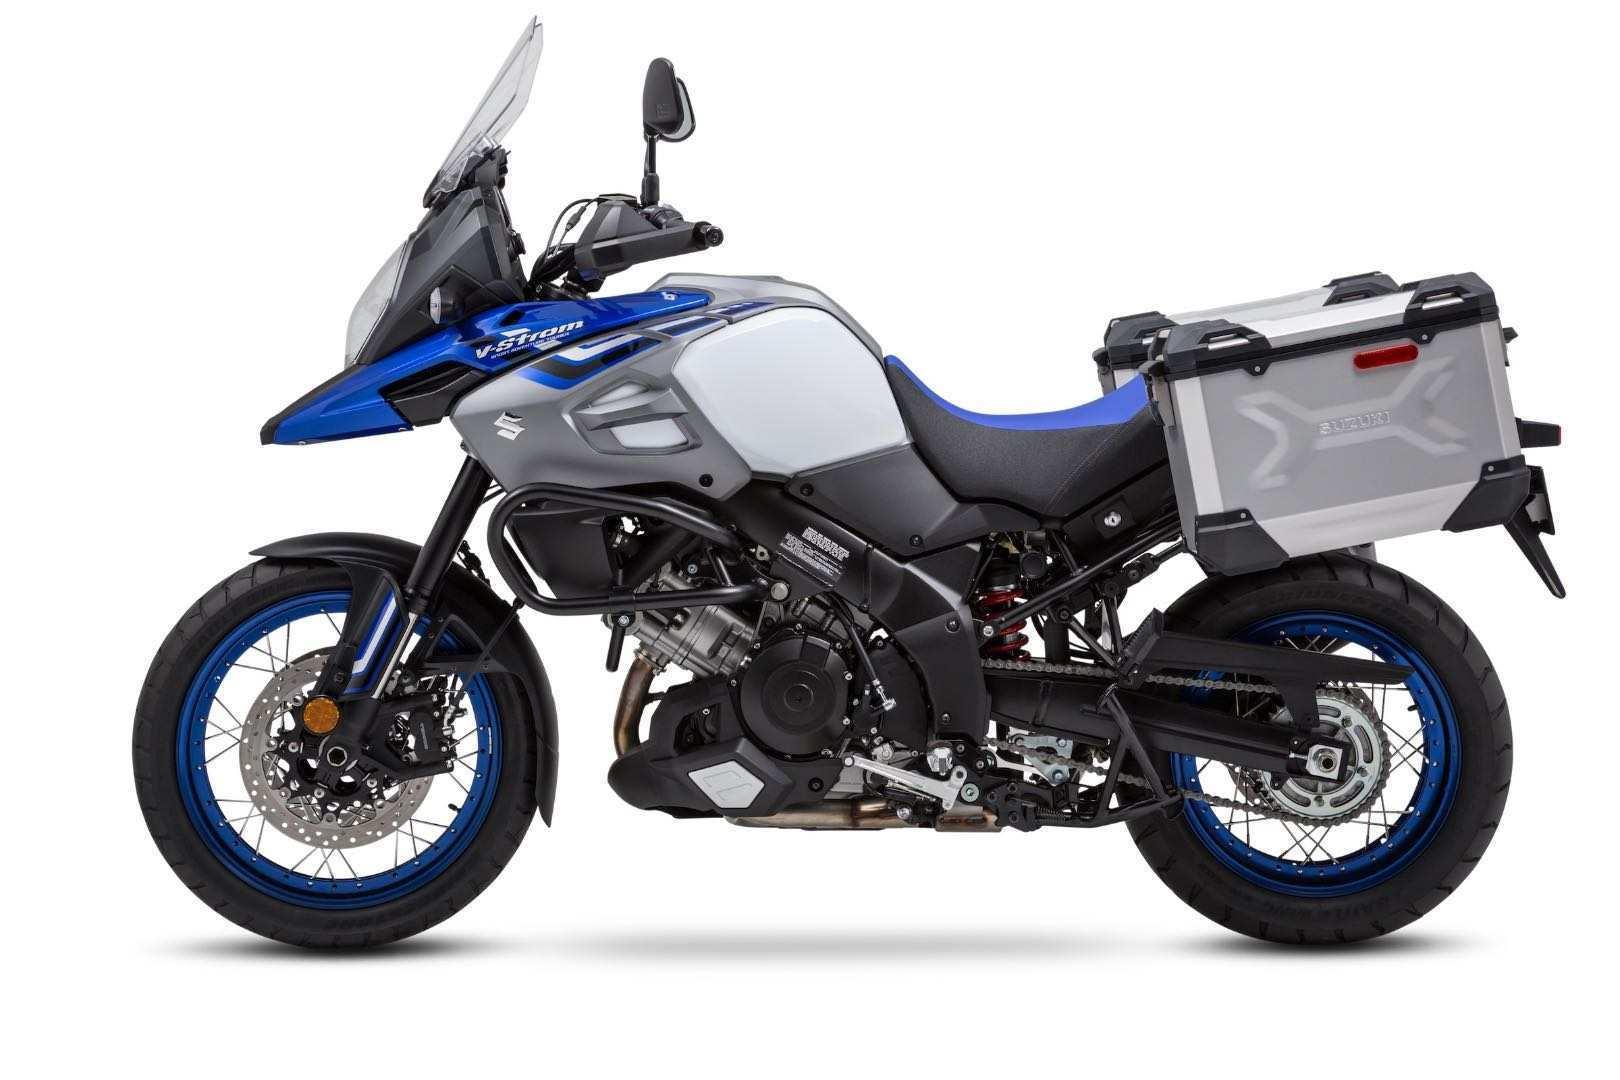 72 Concept of Suzuki V Strom 2019 Release Date for Suzuki V Strom 2019